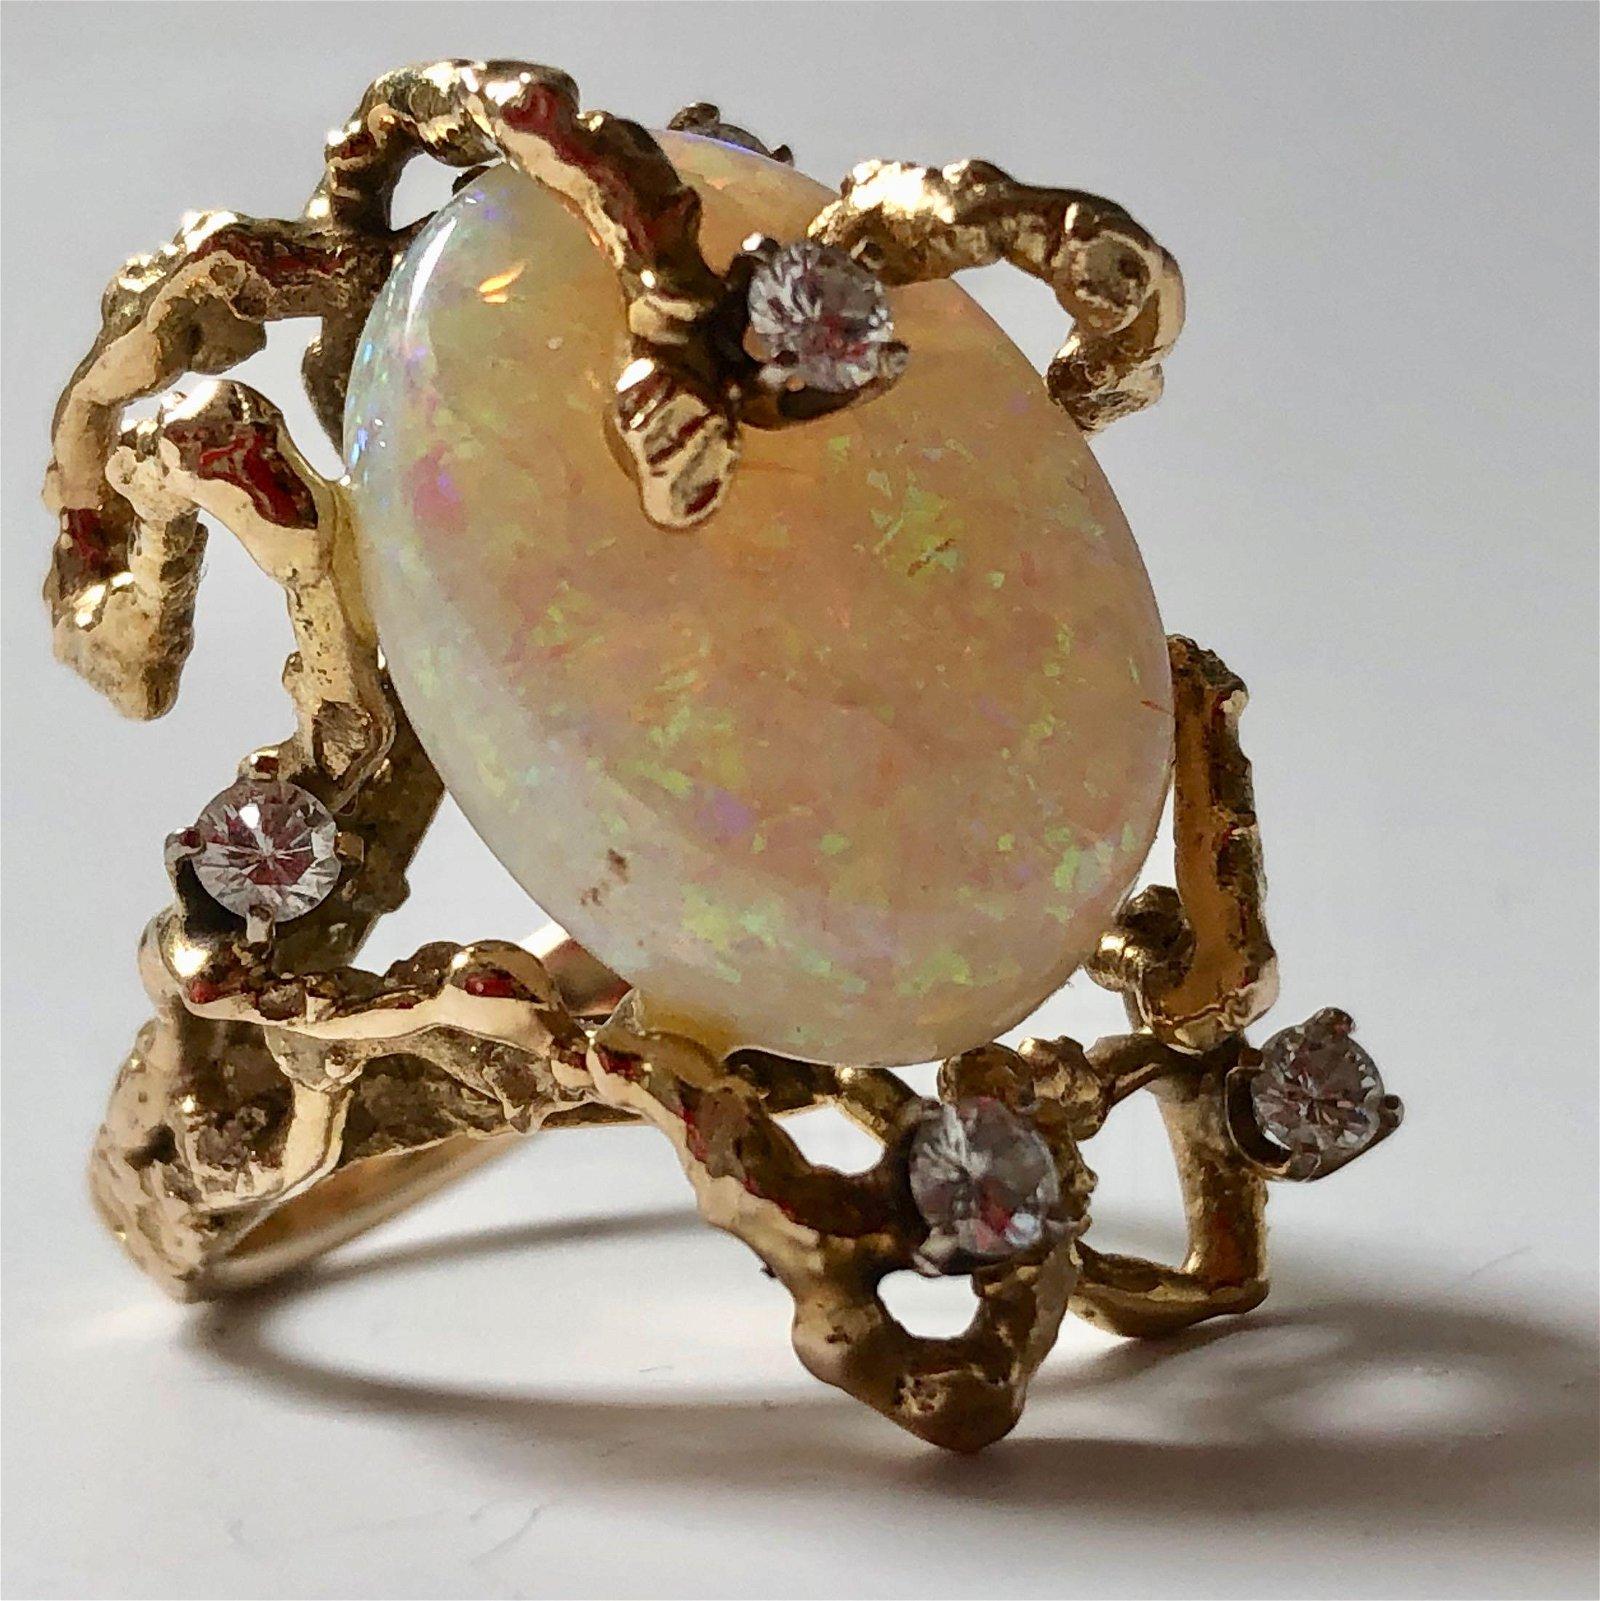 UNUSUAL 14K GOLD DIAMOND OPAL RING